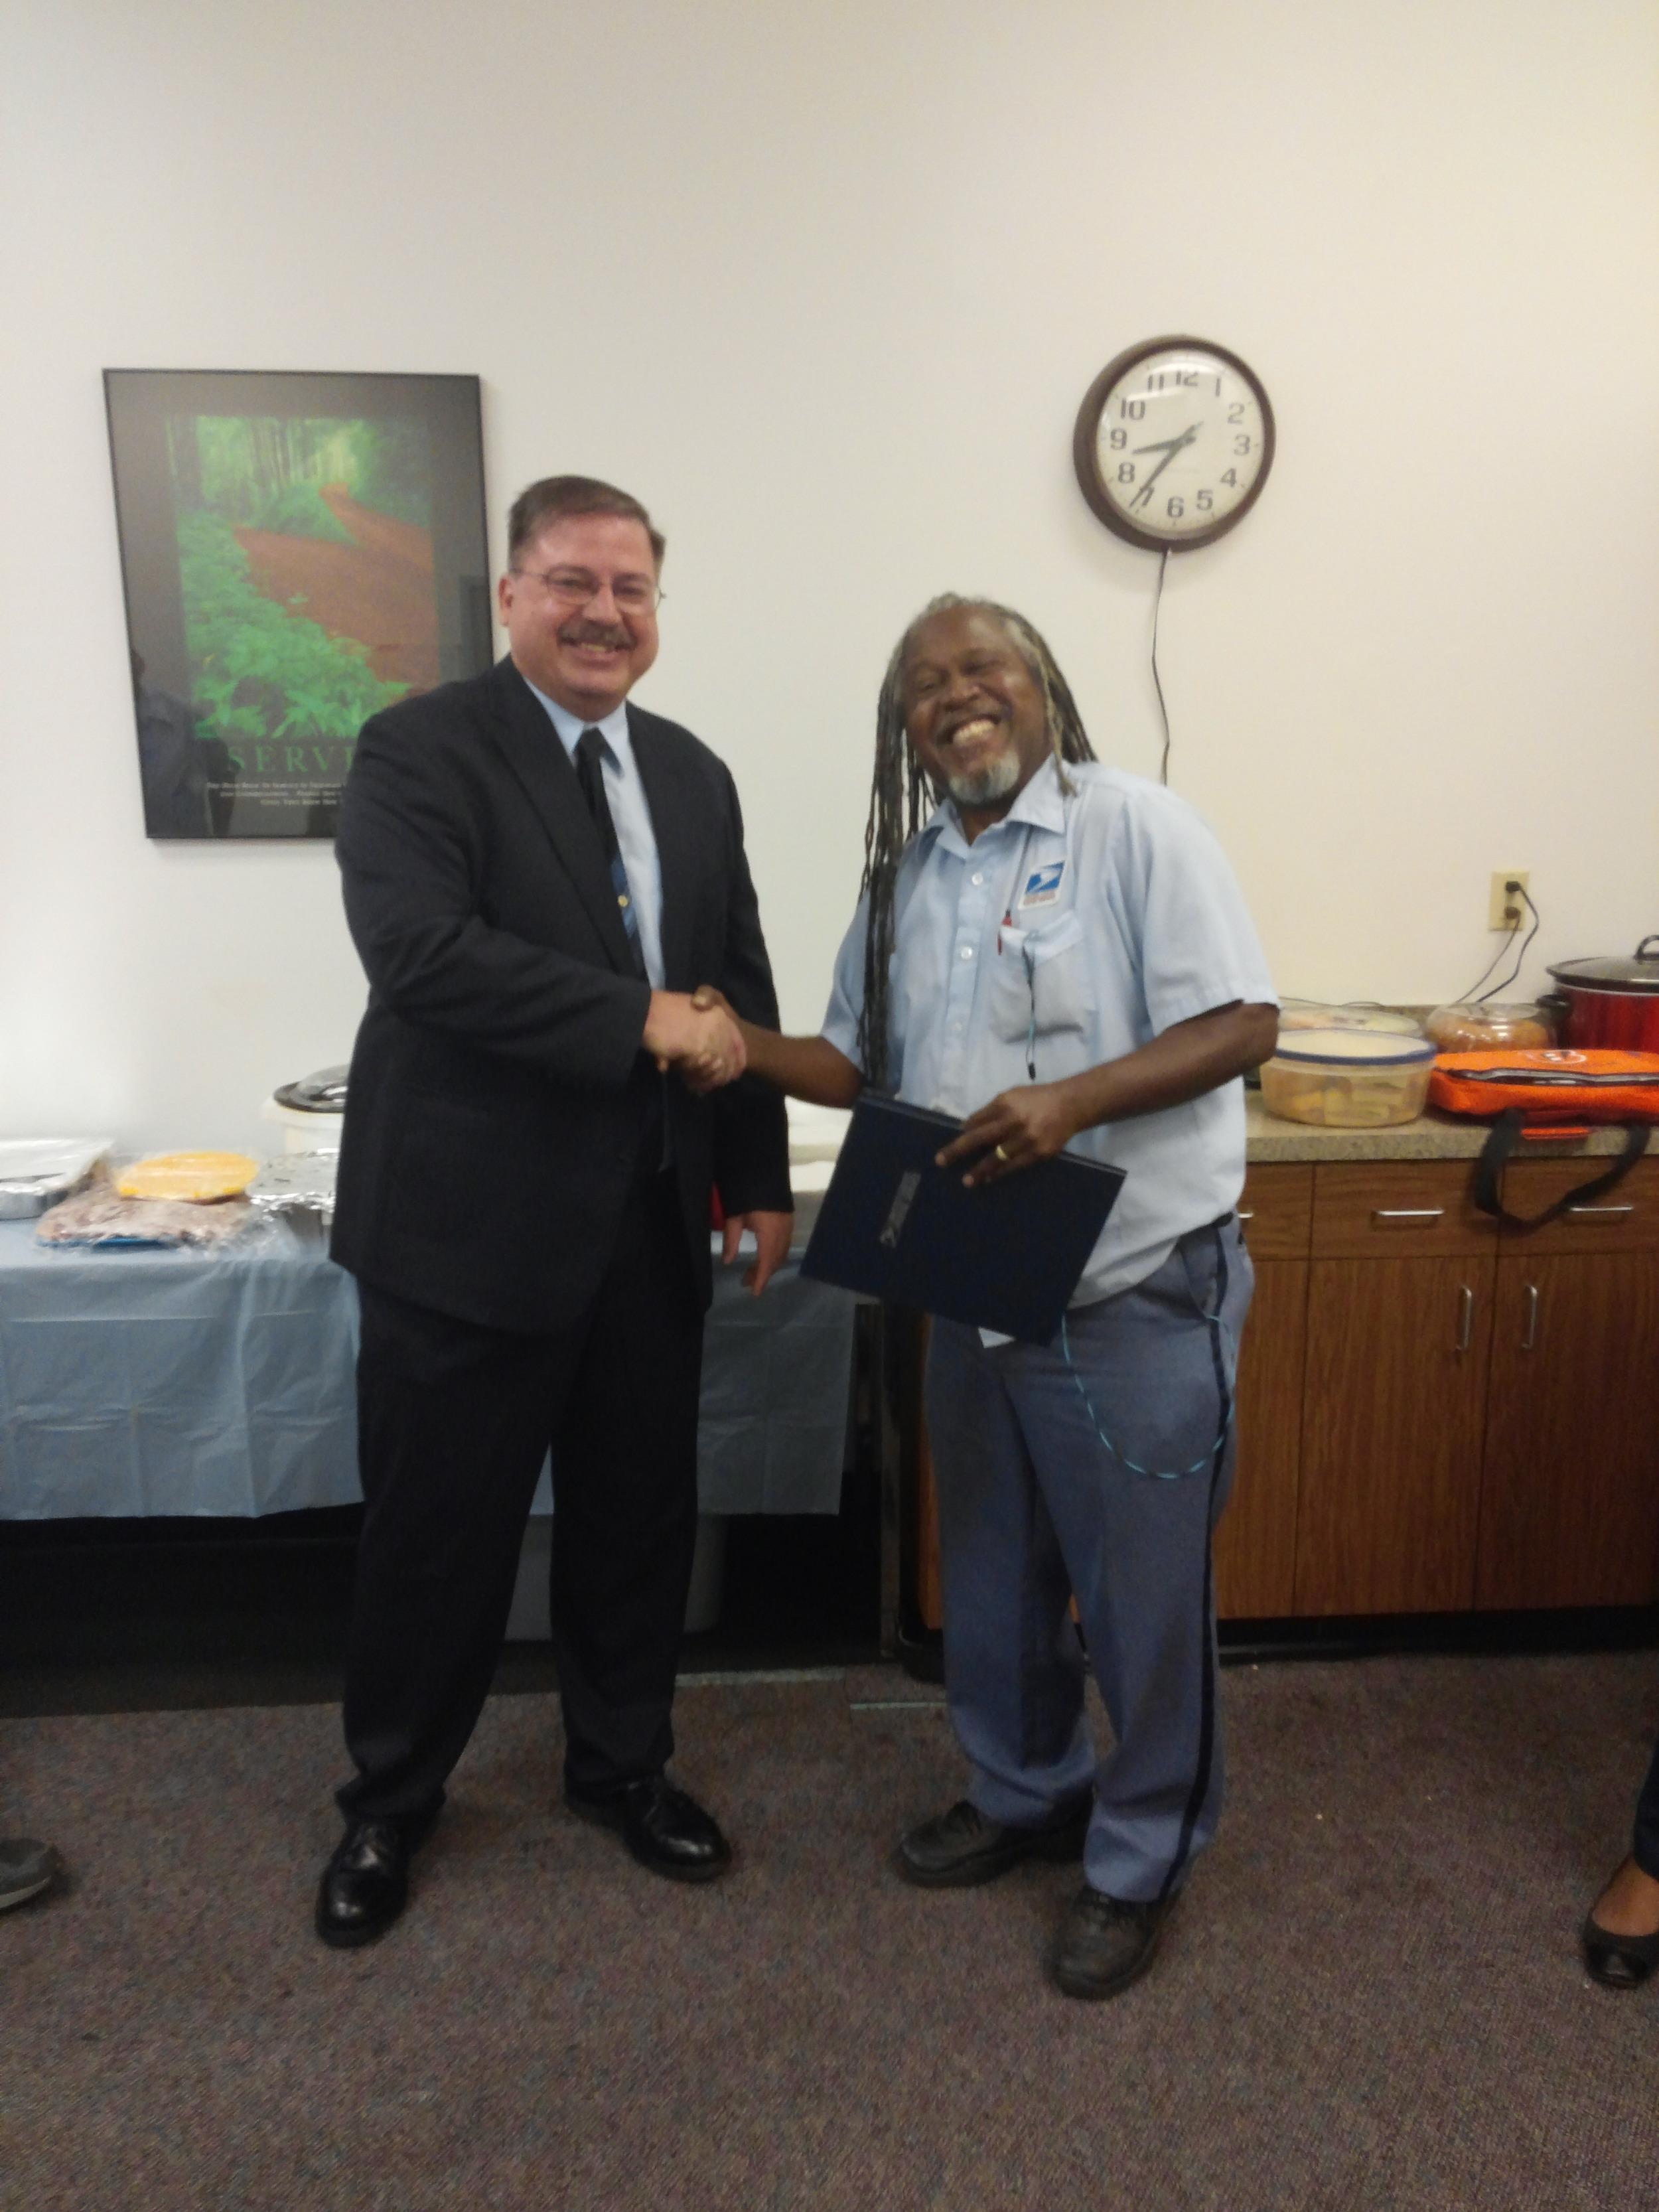 President Todd Hornyak & Chuck Stephenson